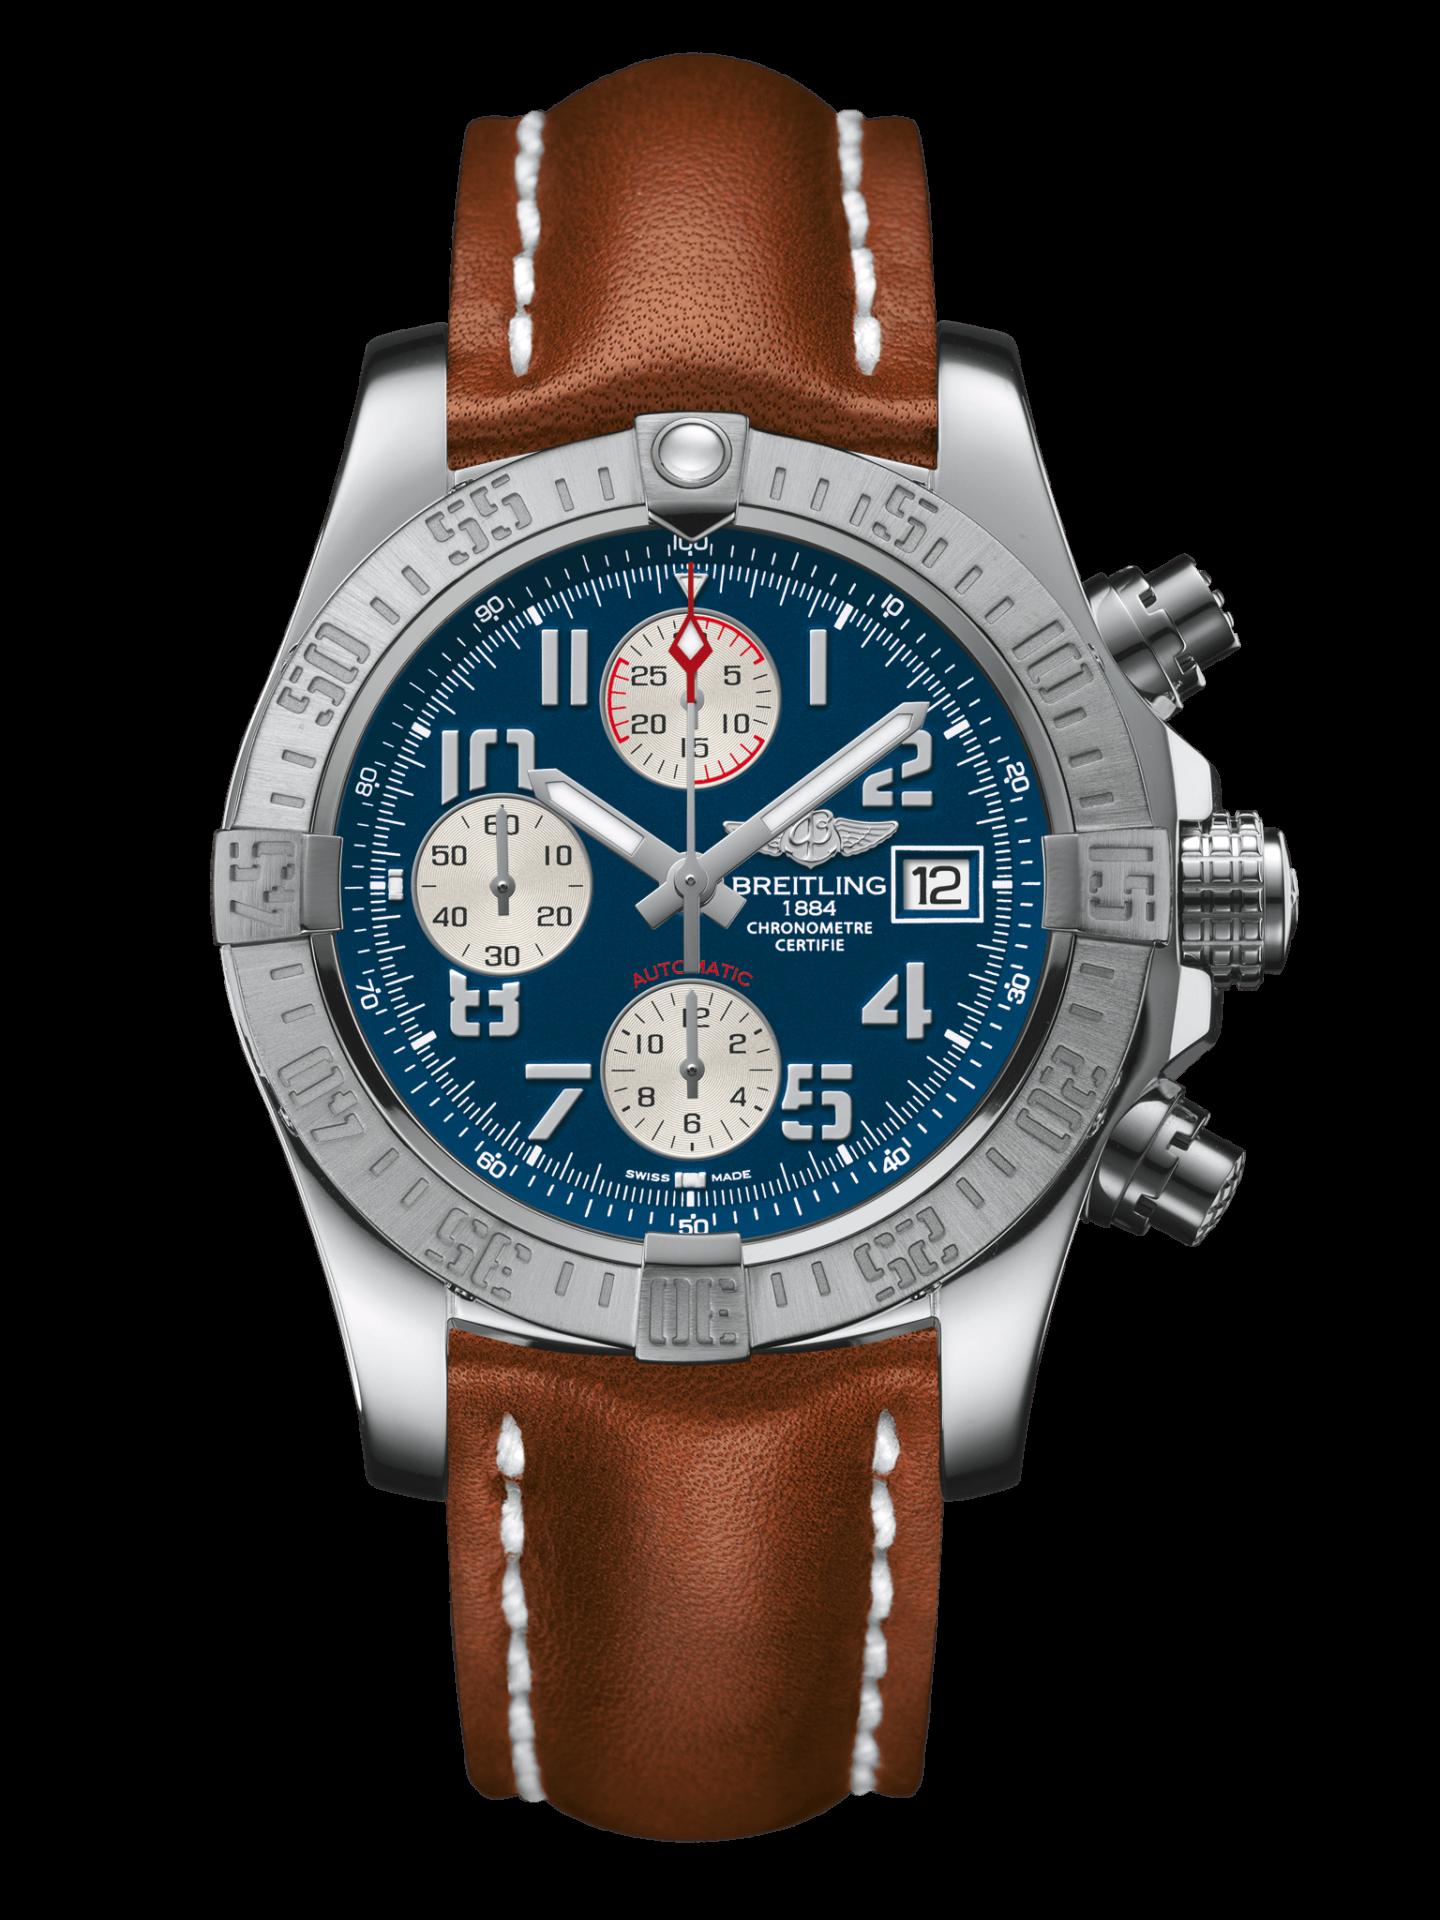 Breitling-Avenger-Avenger-II-Hall-of-Time-A1338111-C870-433X-A20BA.1Breitling-Avenger-Avenger-II-Hall-of-Time-A1338111-C870-433X-A20BA.1